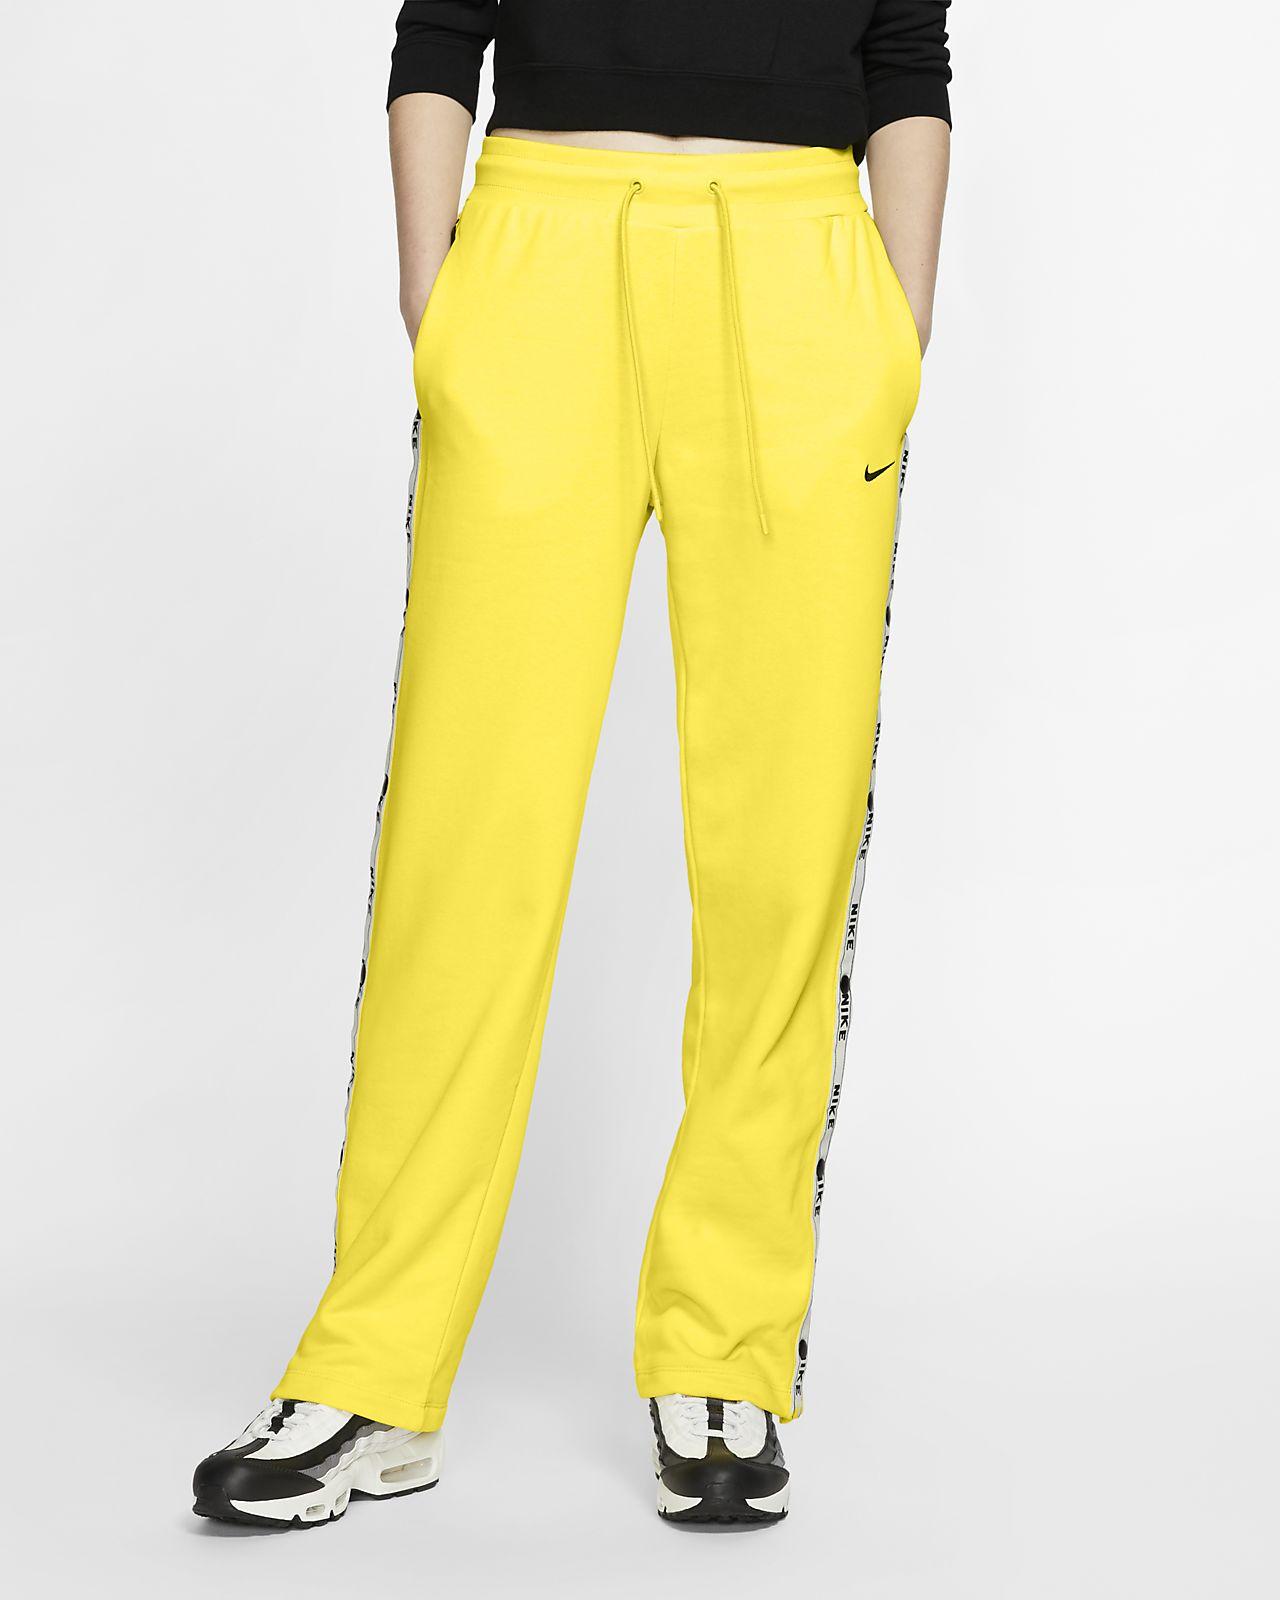 bea10d18b284e Pantalones con logotipo para mujer Nike Sportswear. Nike.com MX